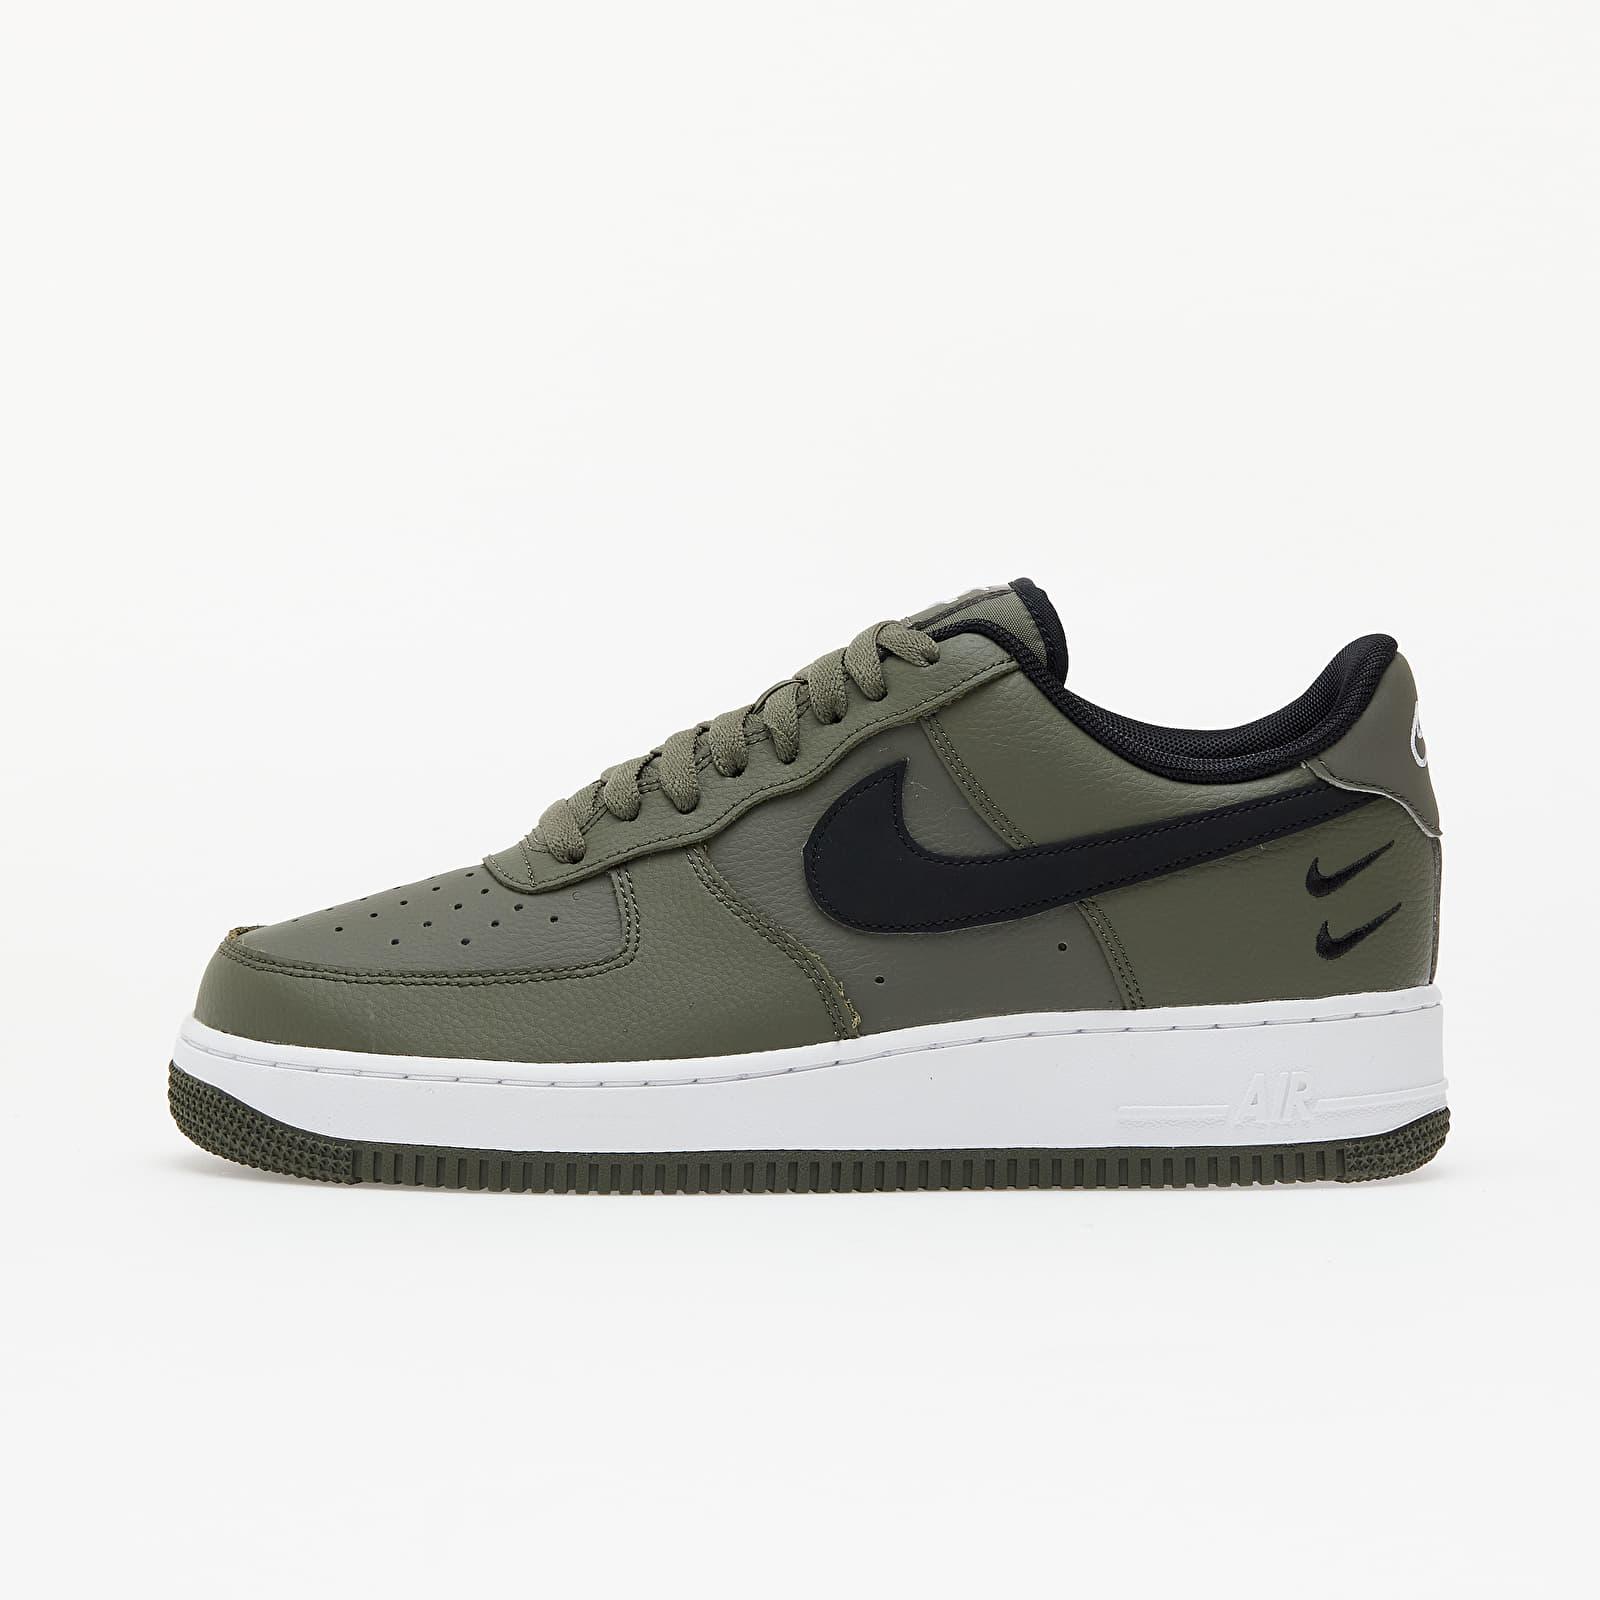 Nike Air Force 1 '07 Twilight Marsh/ Black-White CT2300-300